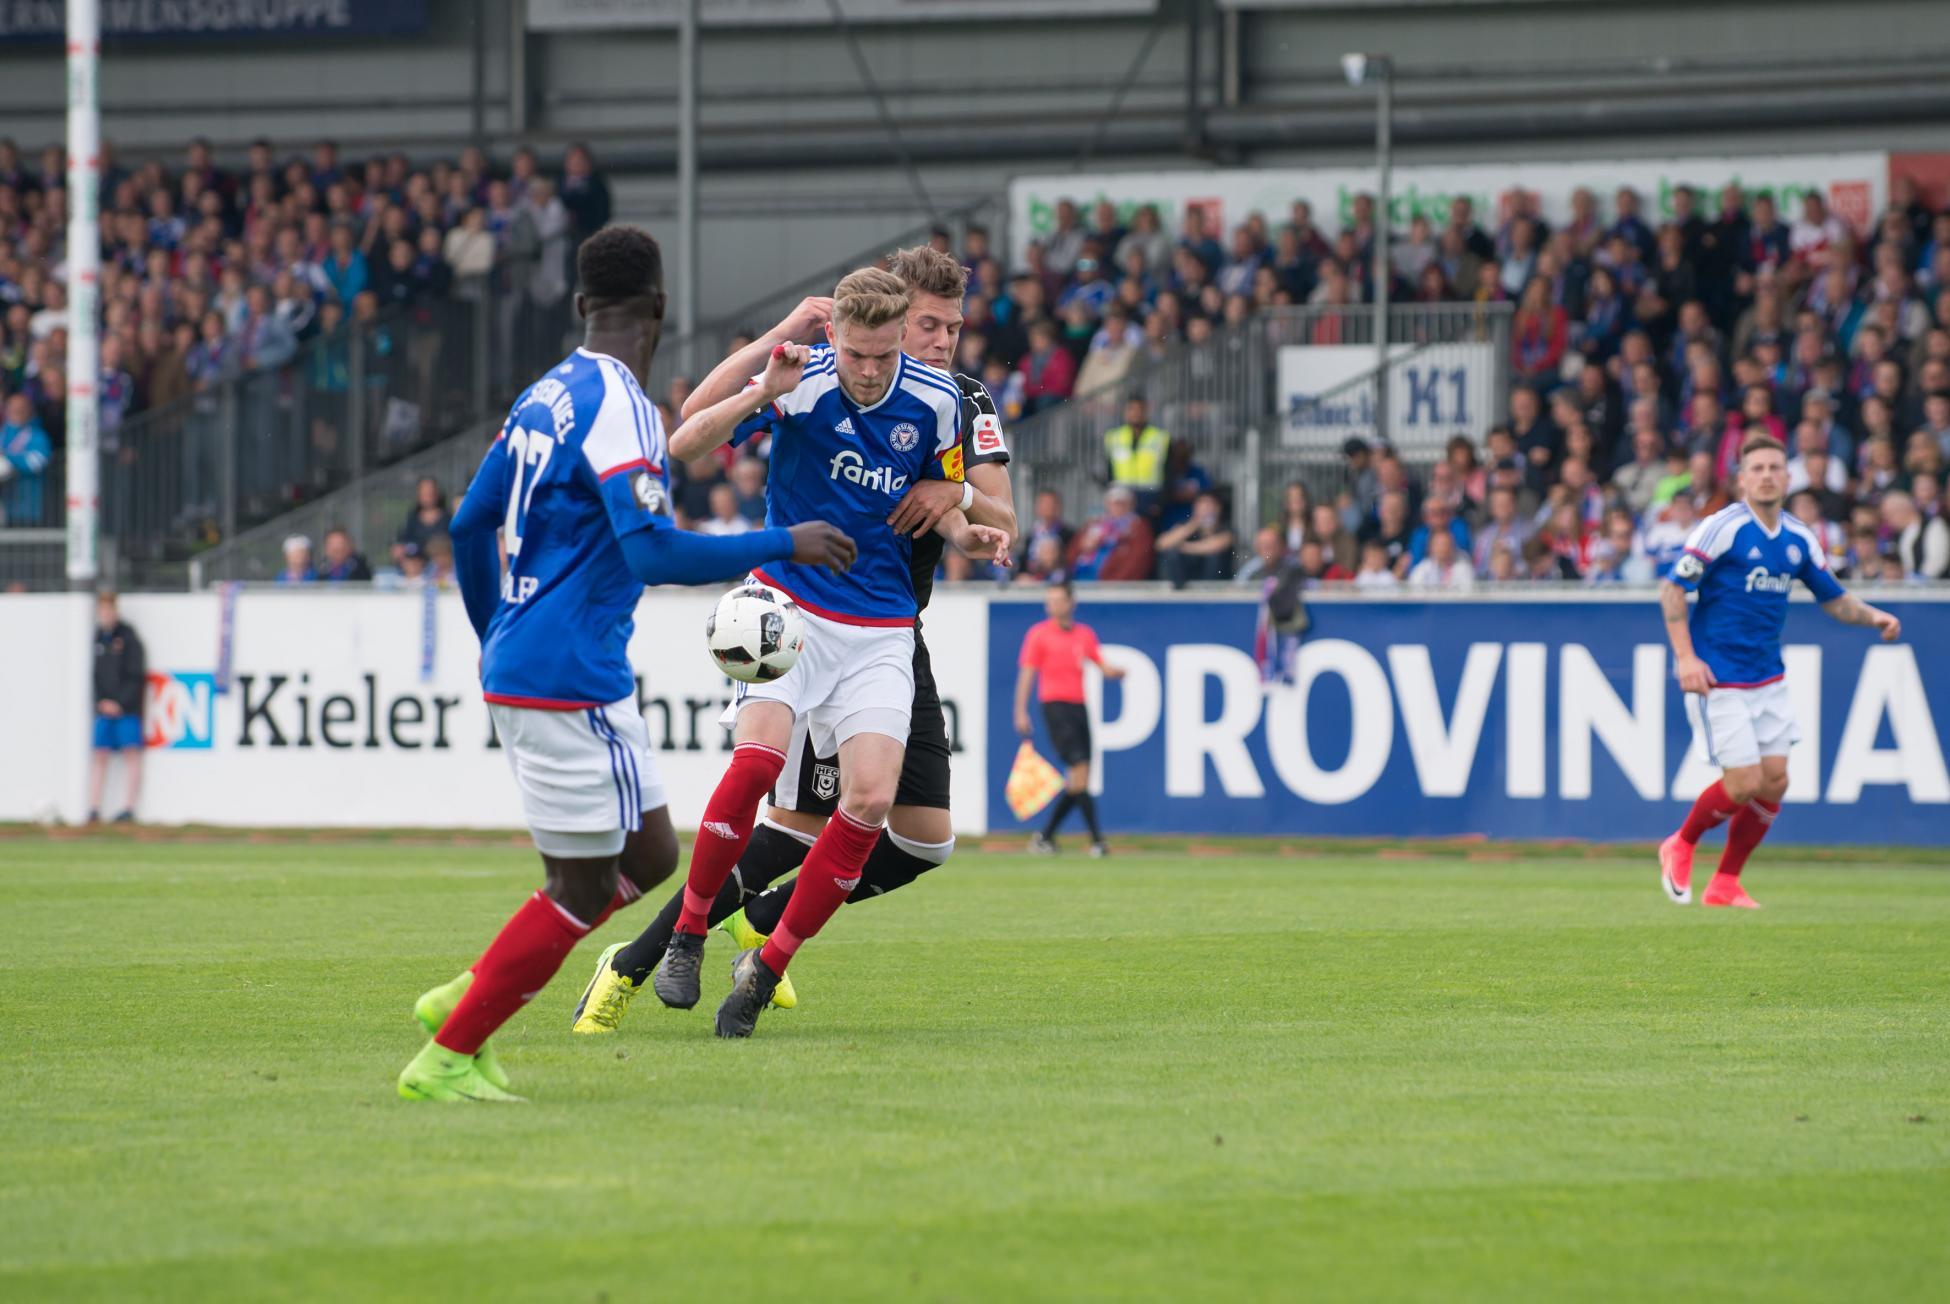 Holstein Kiel Aufstieg 2. Liga